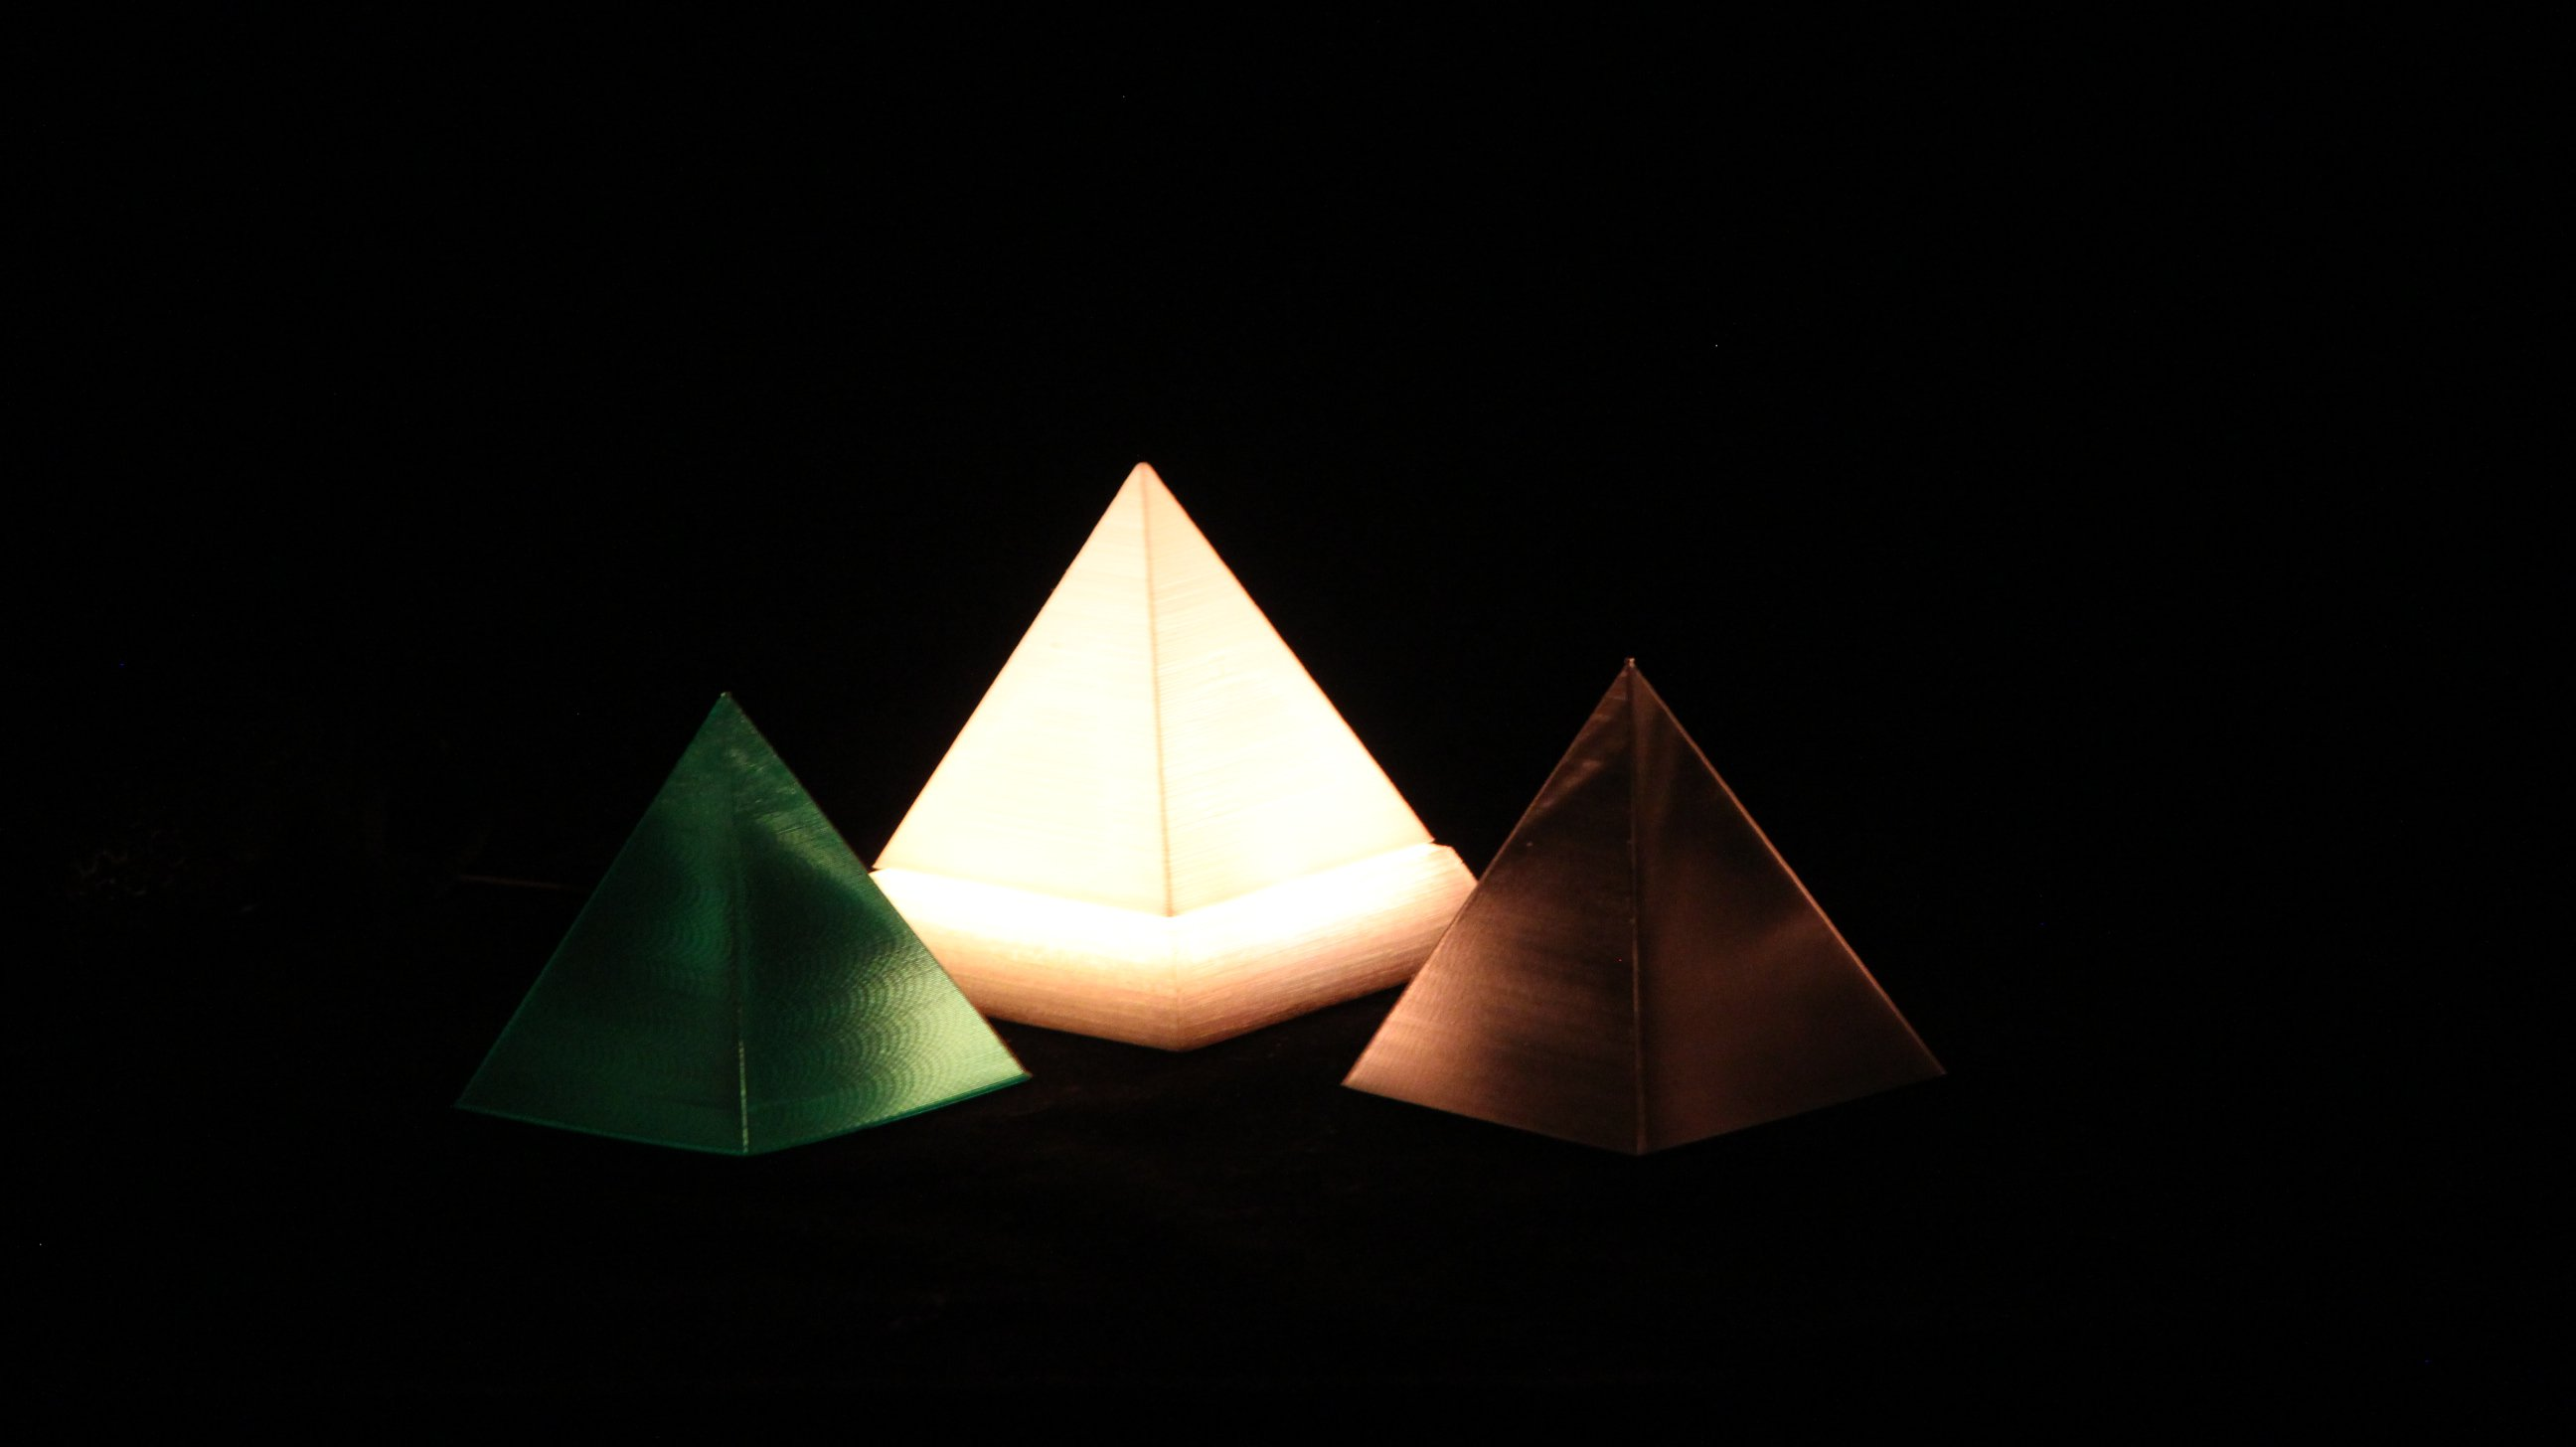 Printed Pyramid Iot Led Light By Richard Swika